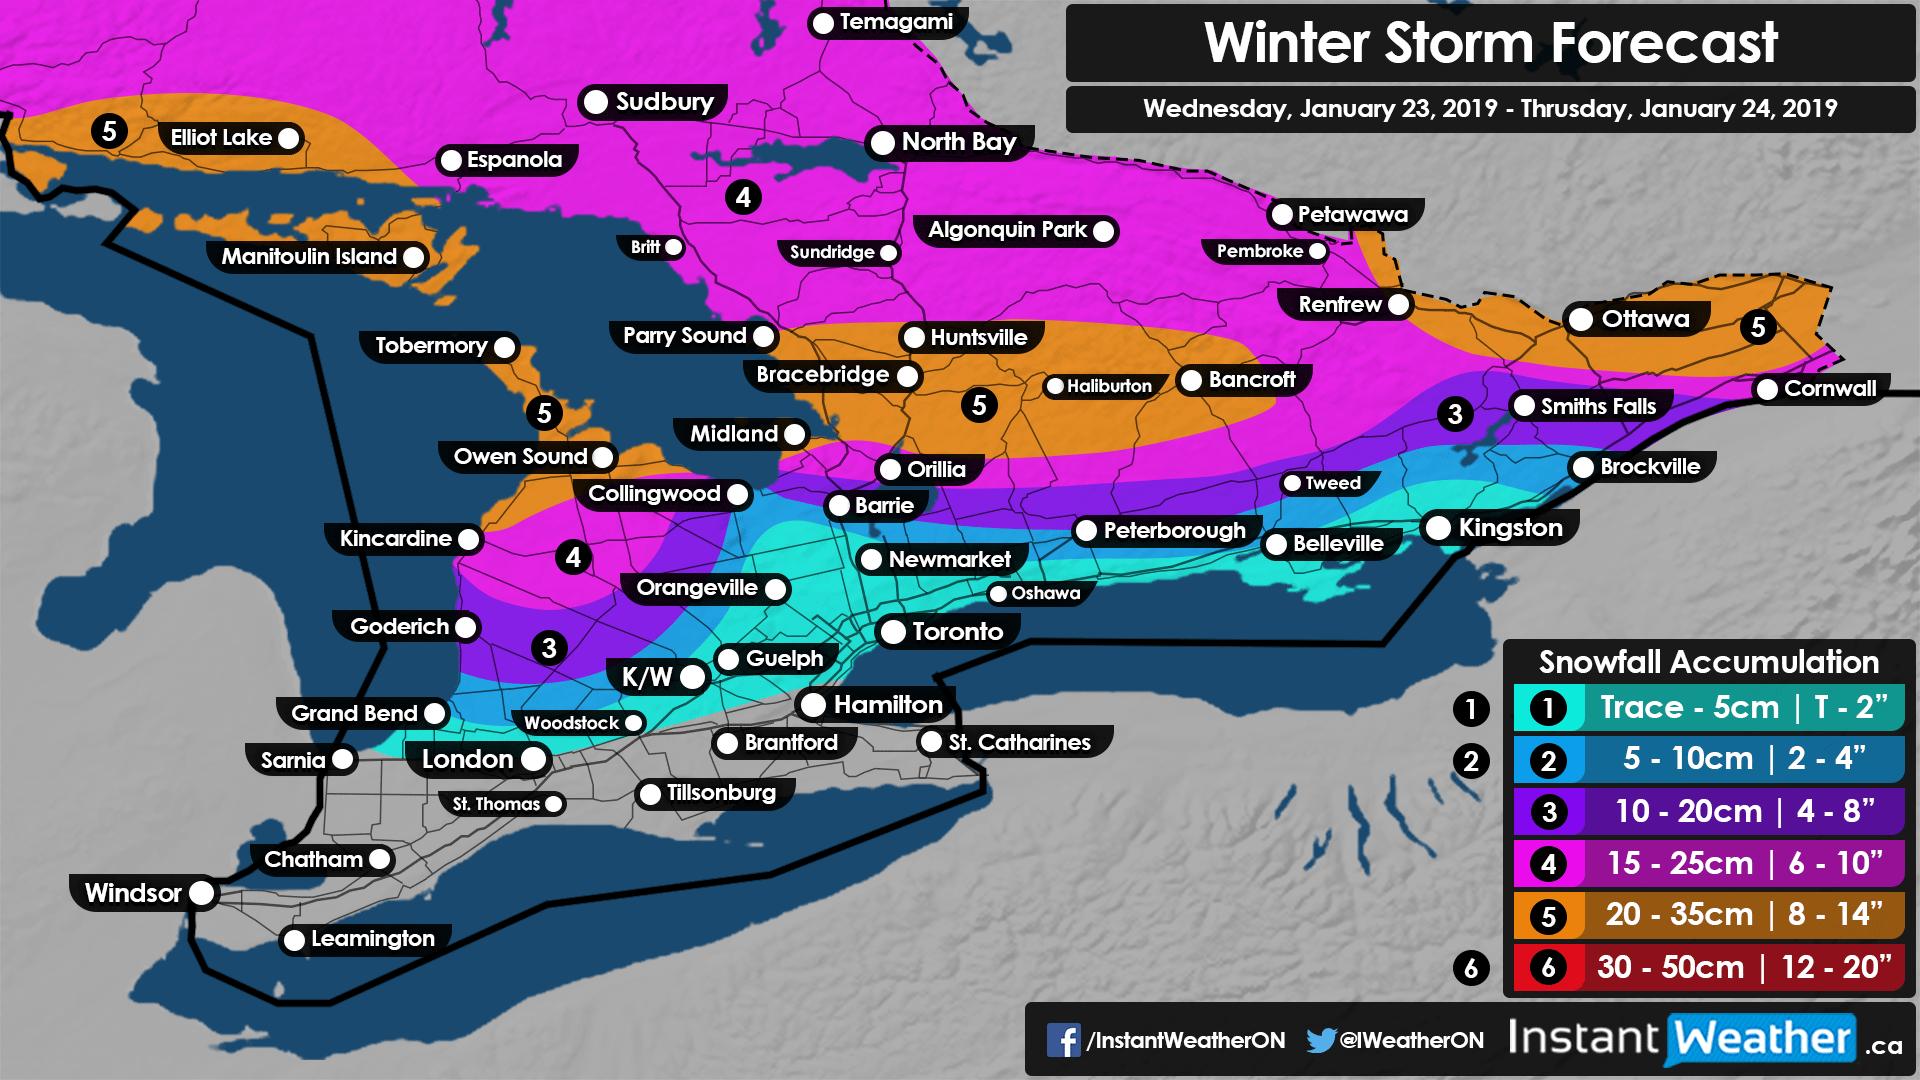 Winter Storm to Wreak Havoc on the Wednesday Morning/Evening